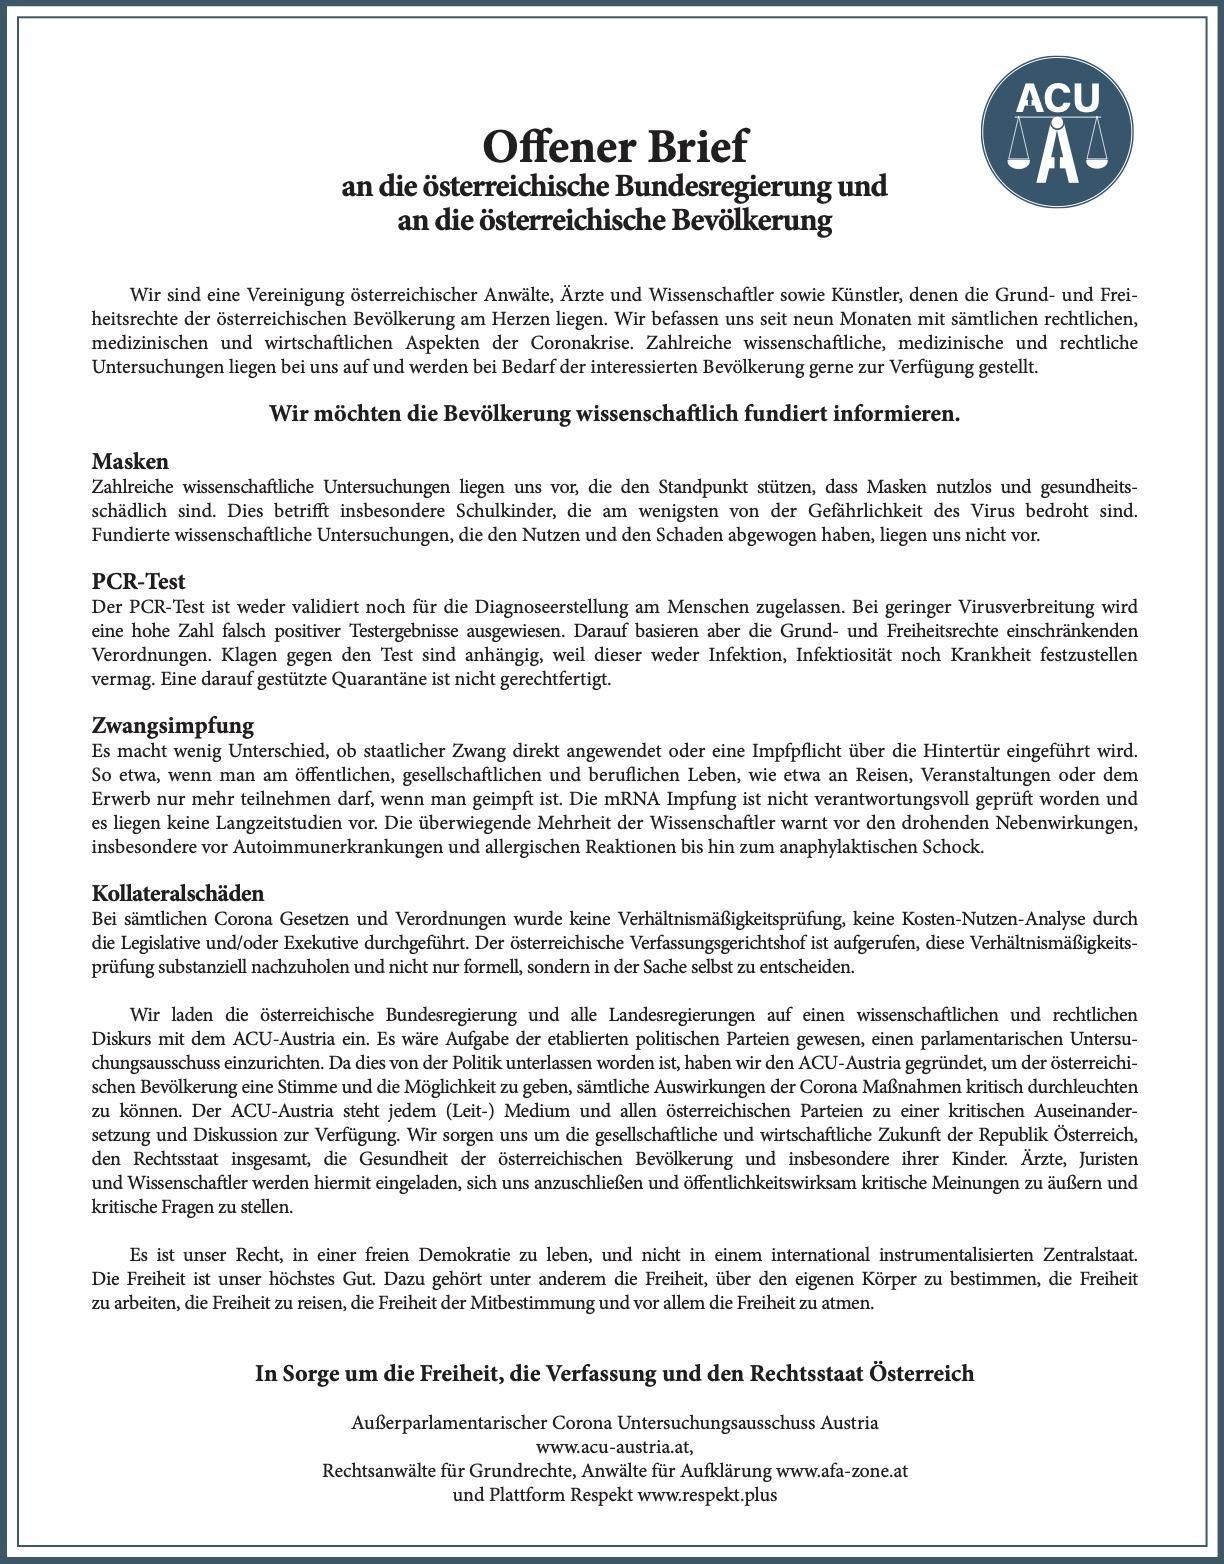 Offener Brief ACU-Austria Januar 21